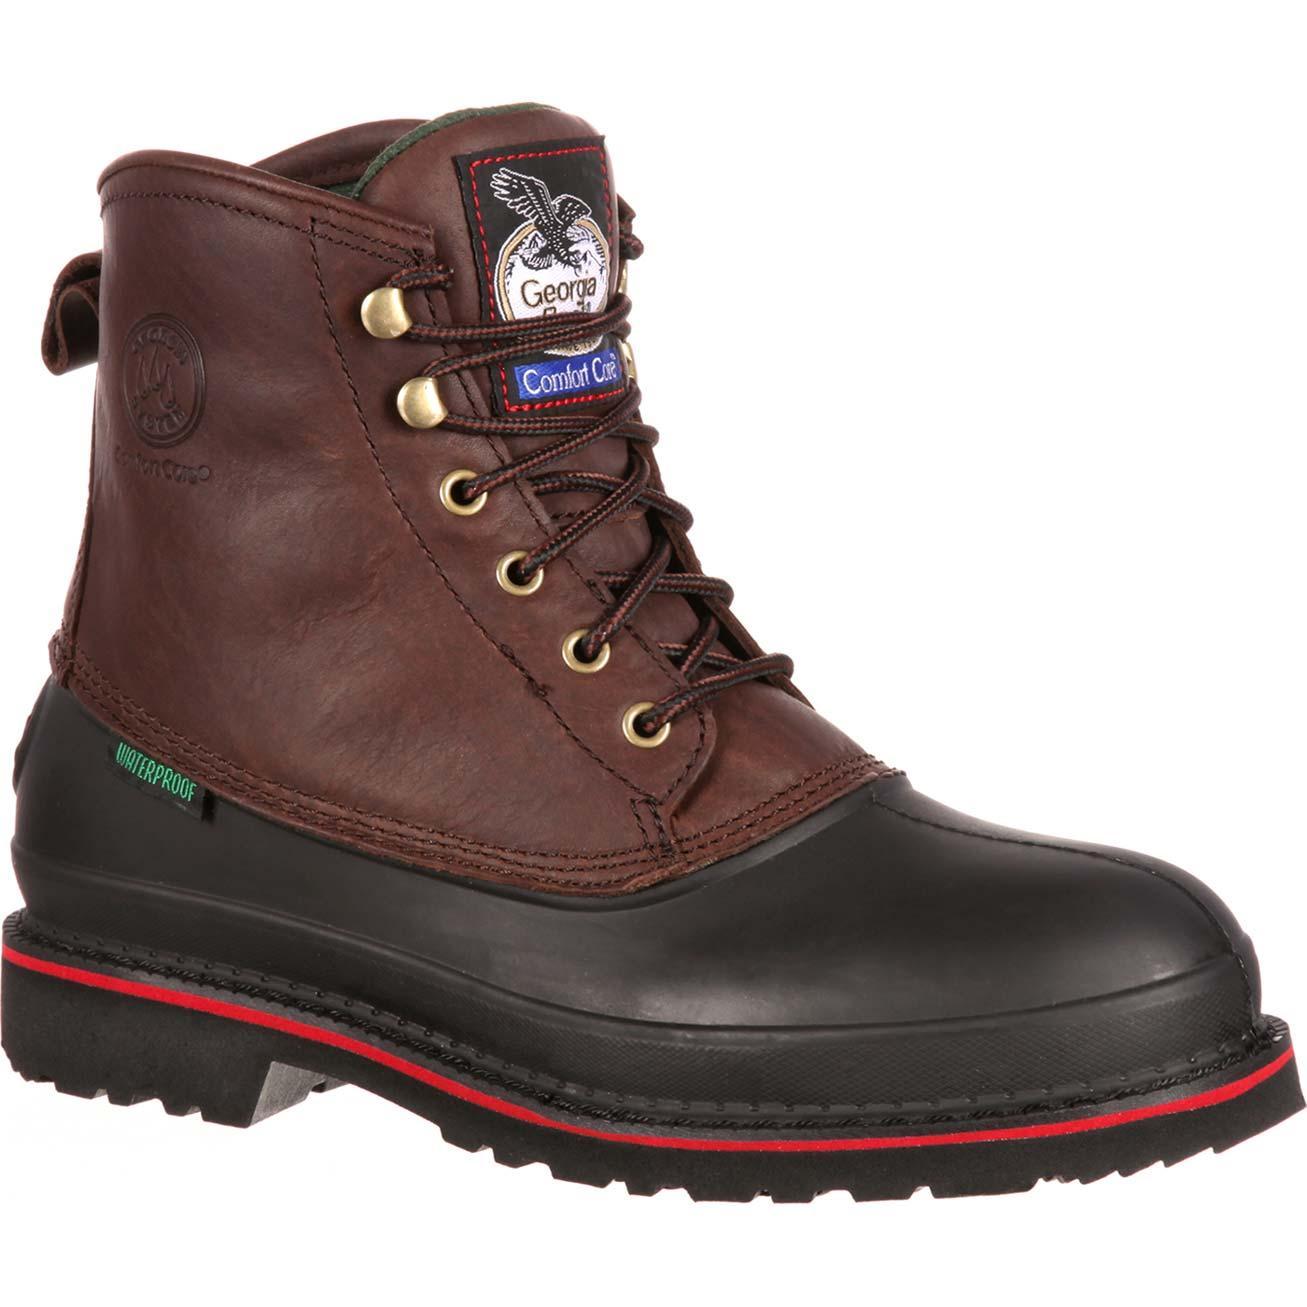 Georgia Muddog: Men's Waterproof Steel Toe Work Boots - Style #G6633